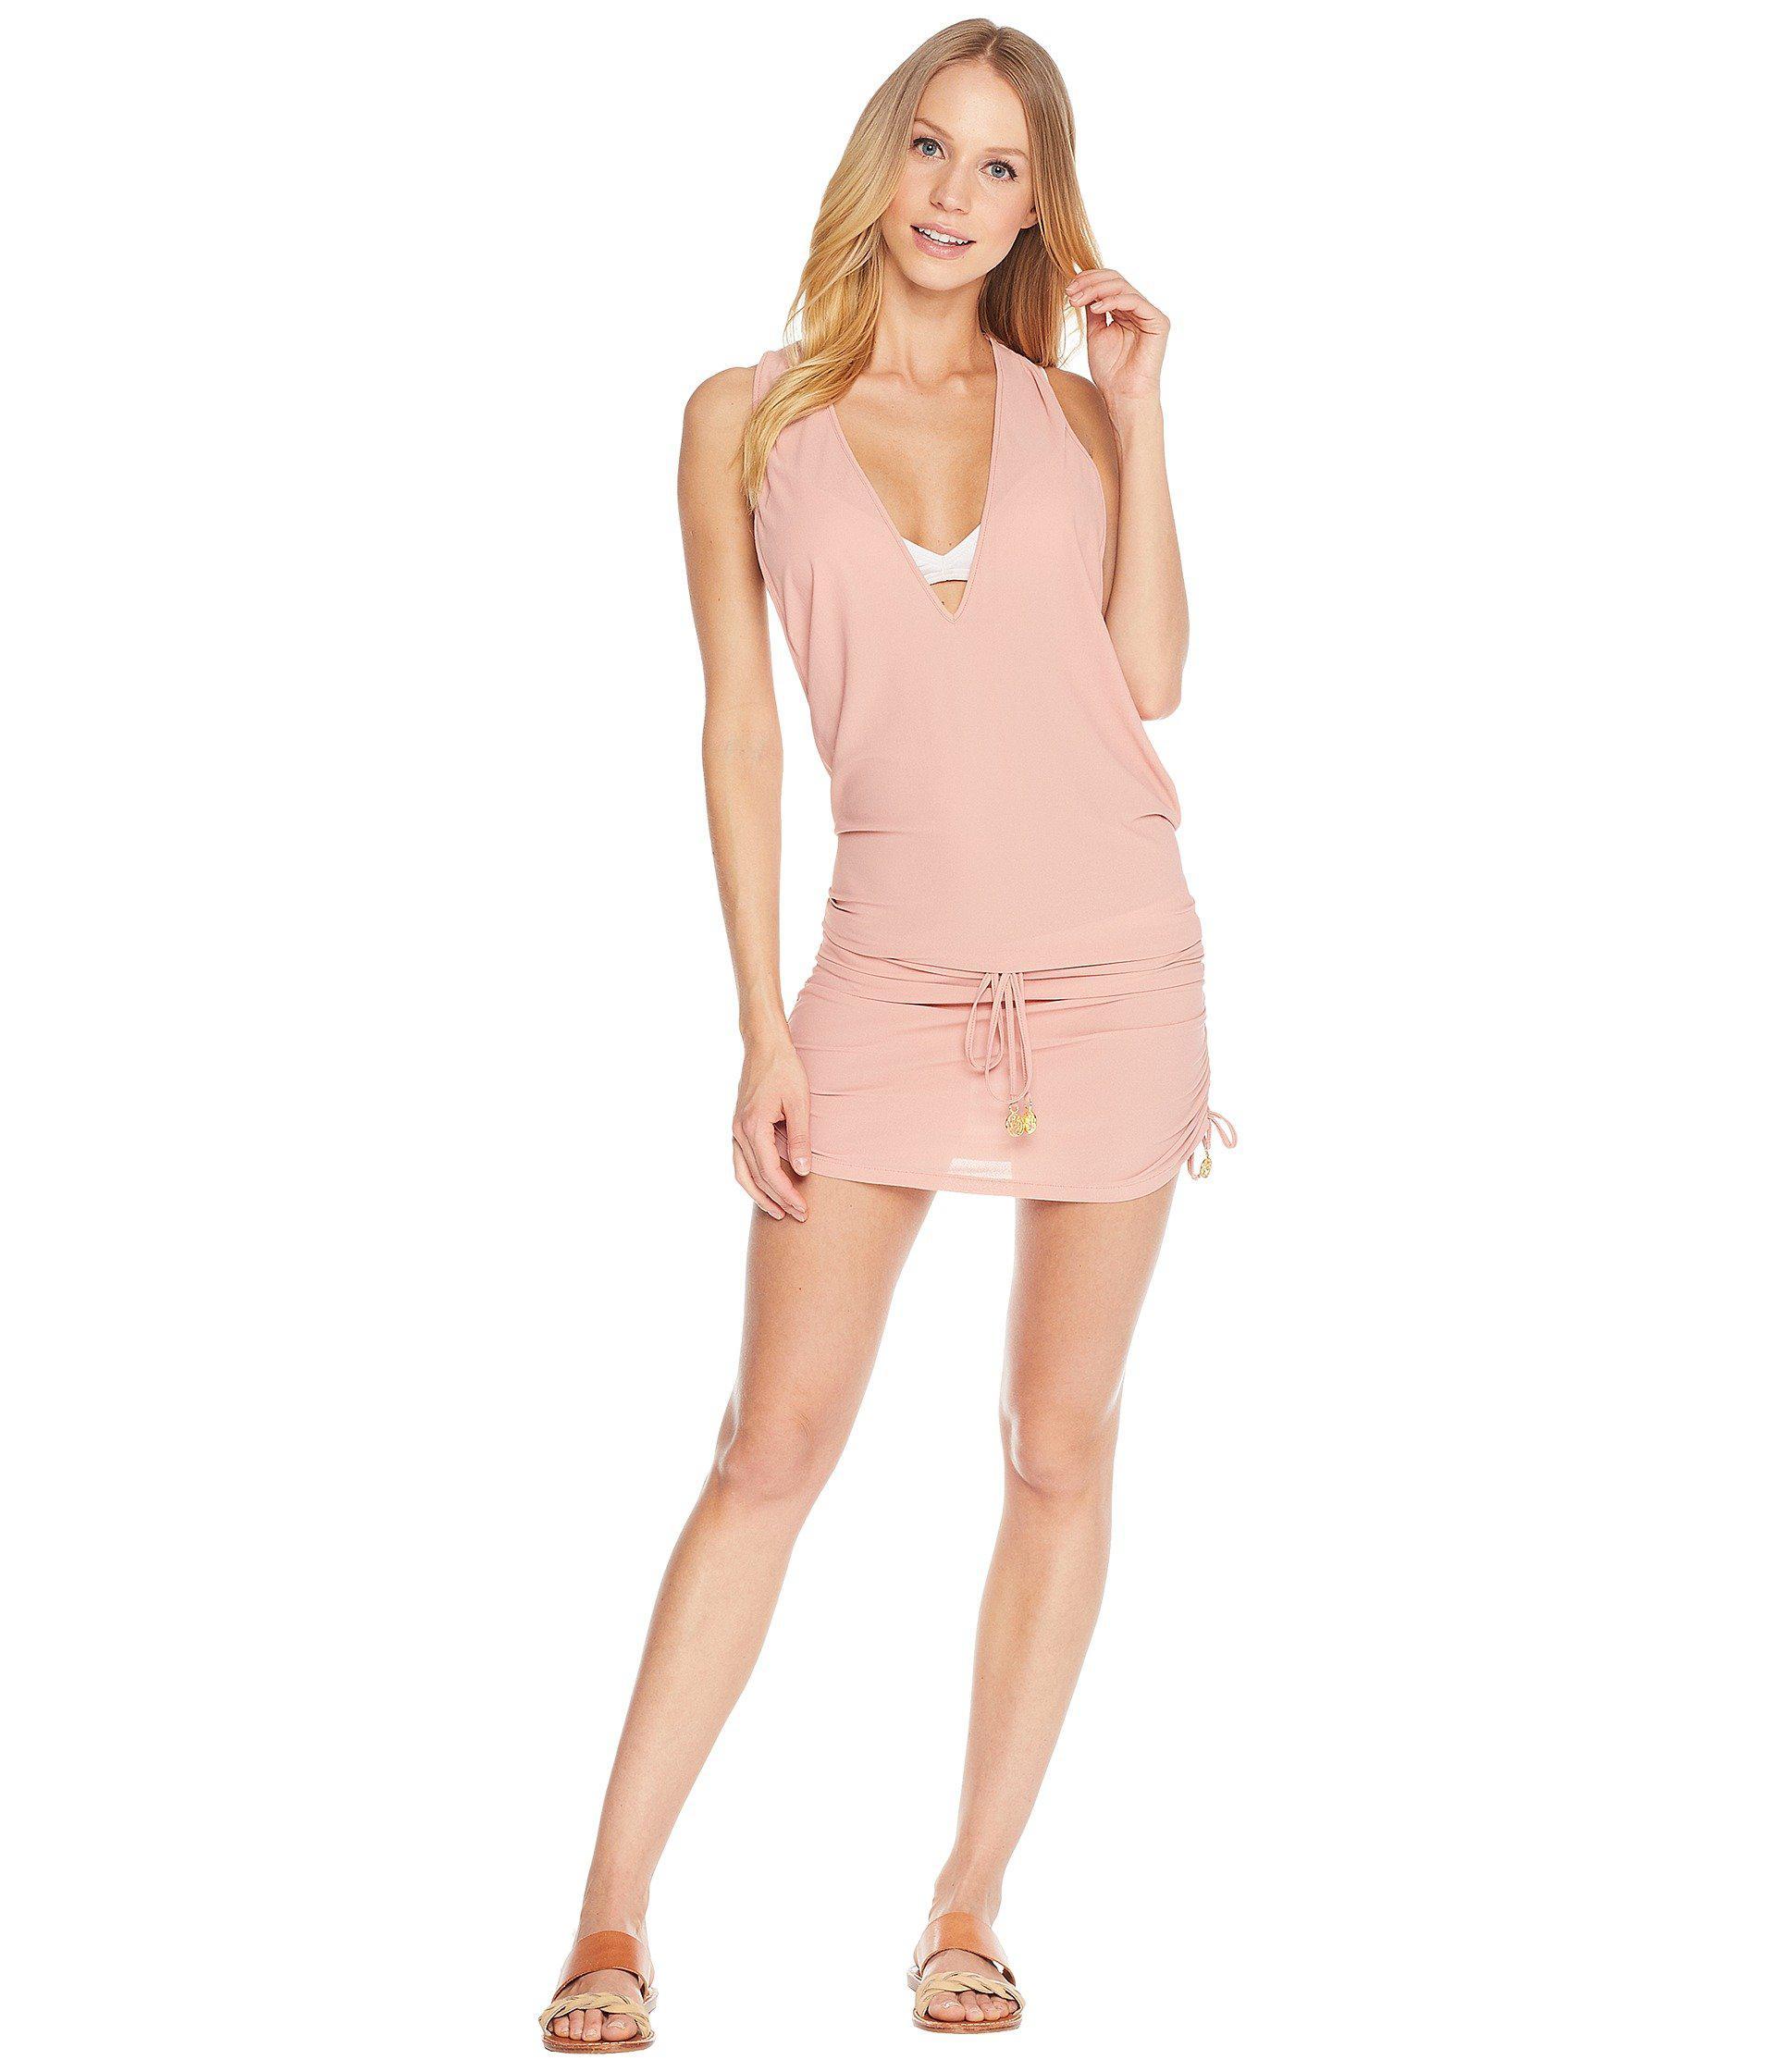 e1d88b013c2 Lyst - Luli Fama Cosita Buena T-back Mini Dress Cover-up (black ...